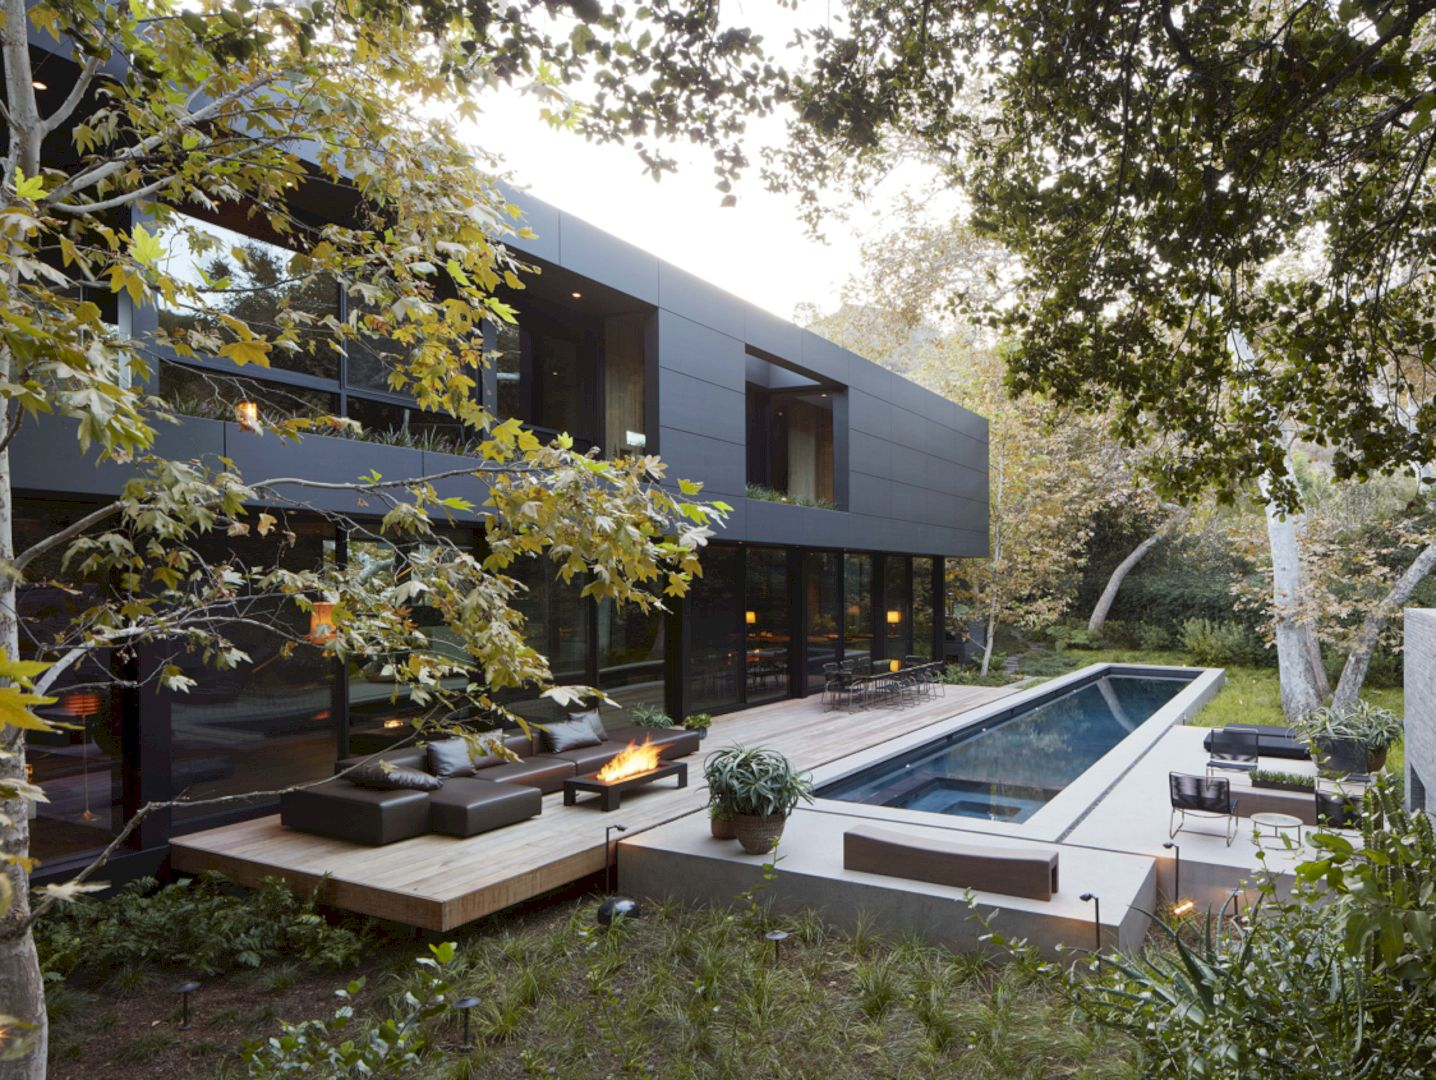 Mandeville Canyon By Marmol Radziner Architecture 15